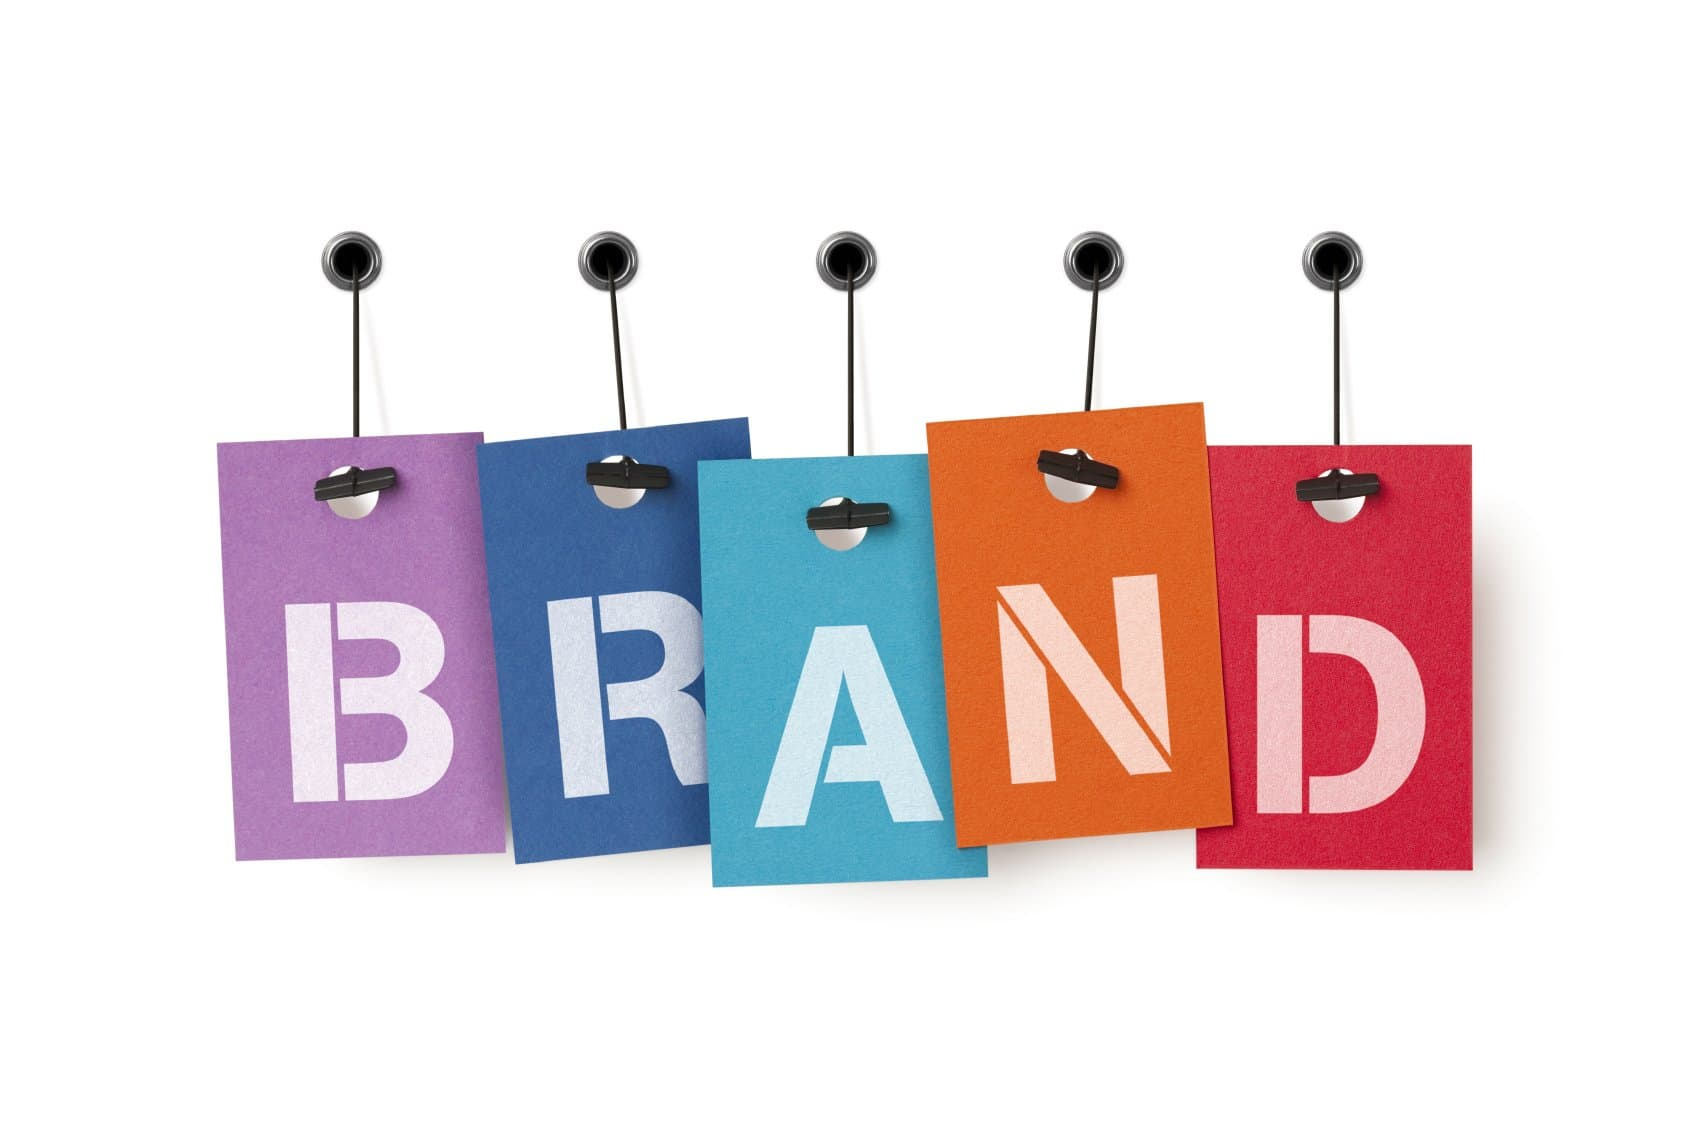 Branding… Did  you say branding?